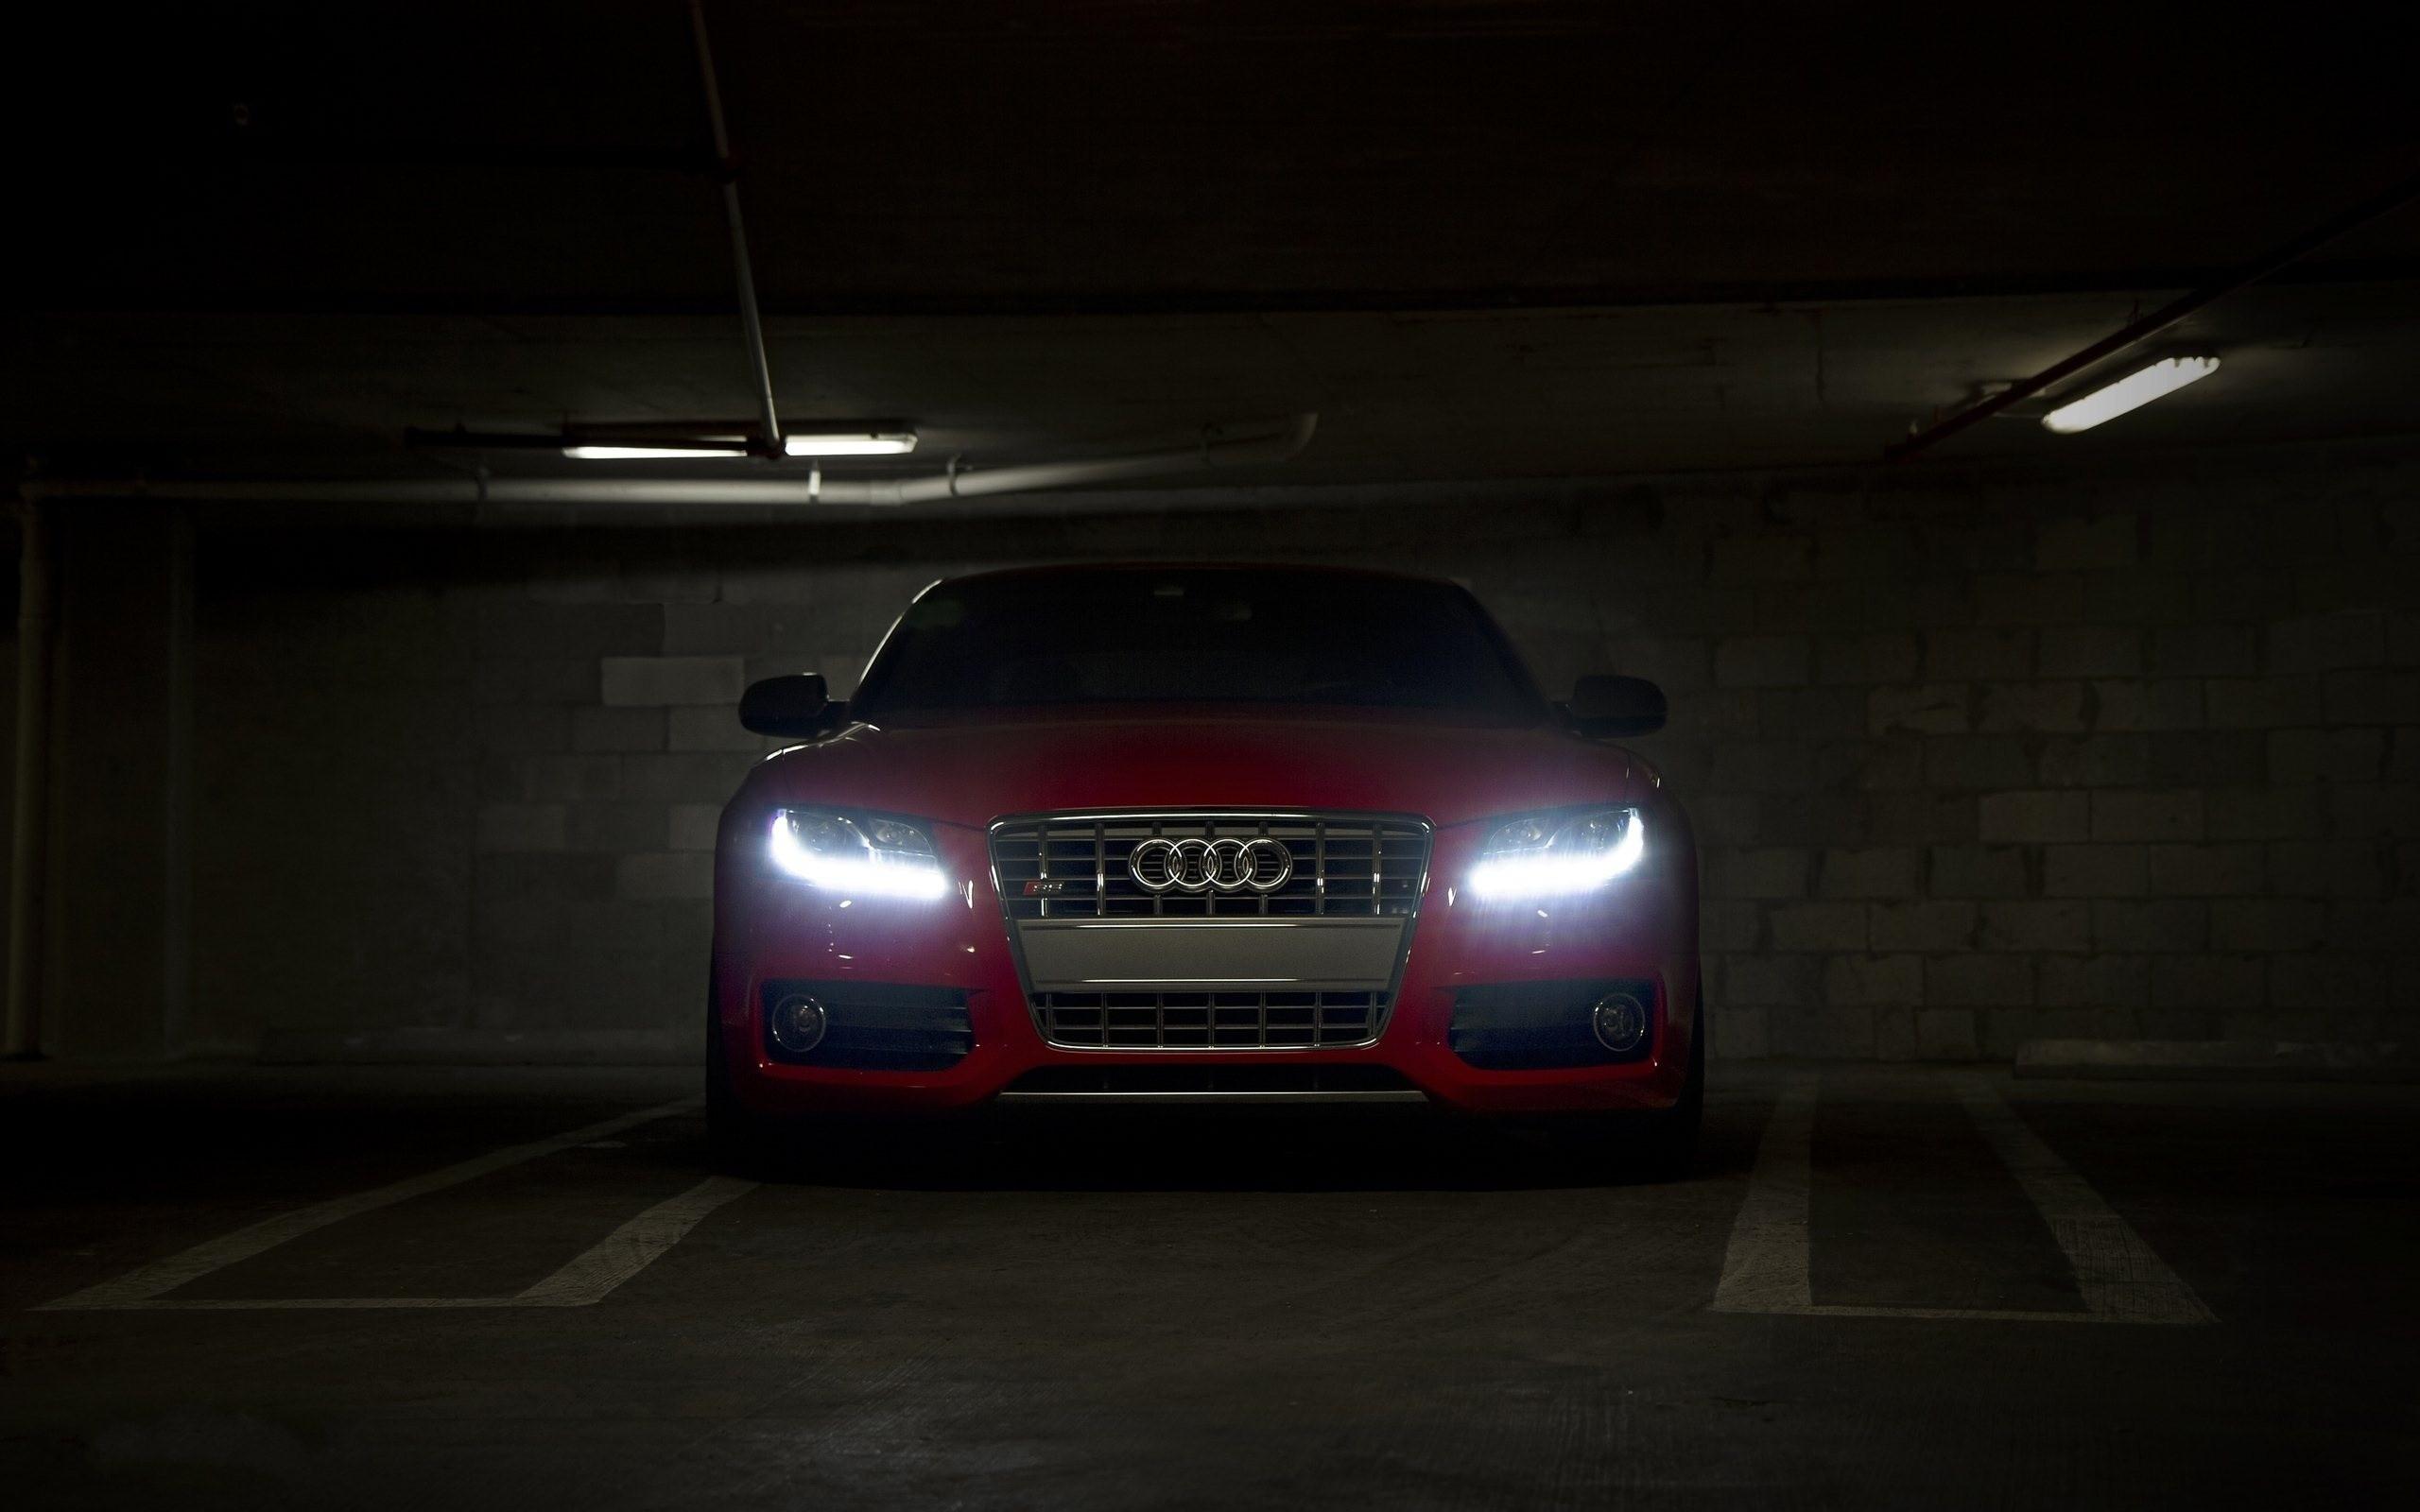 Gorgeous Audi RS5 Wallpaper